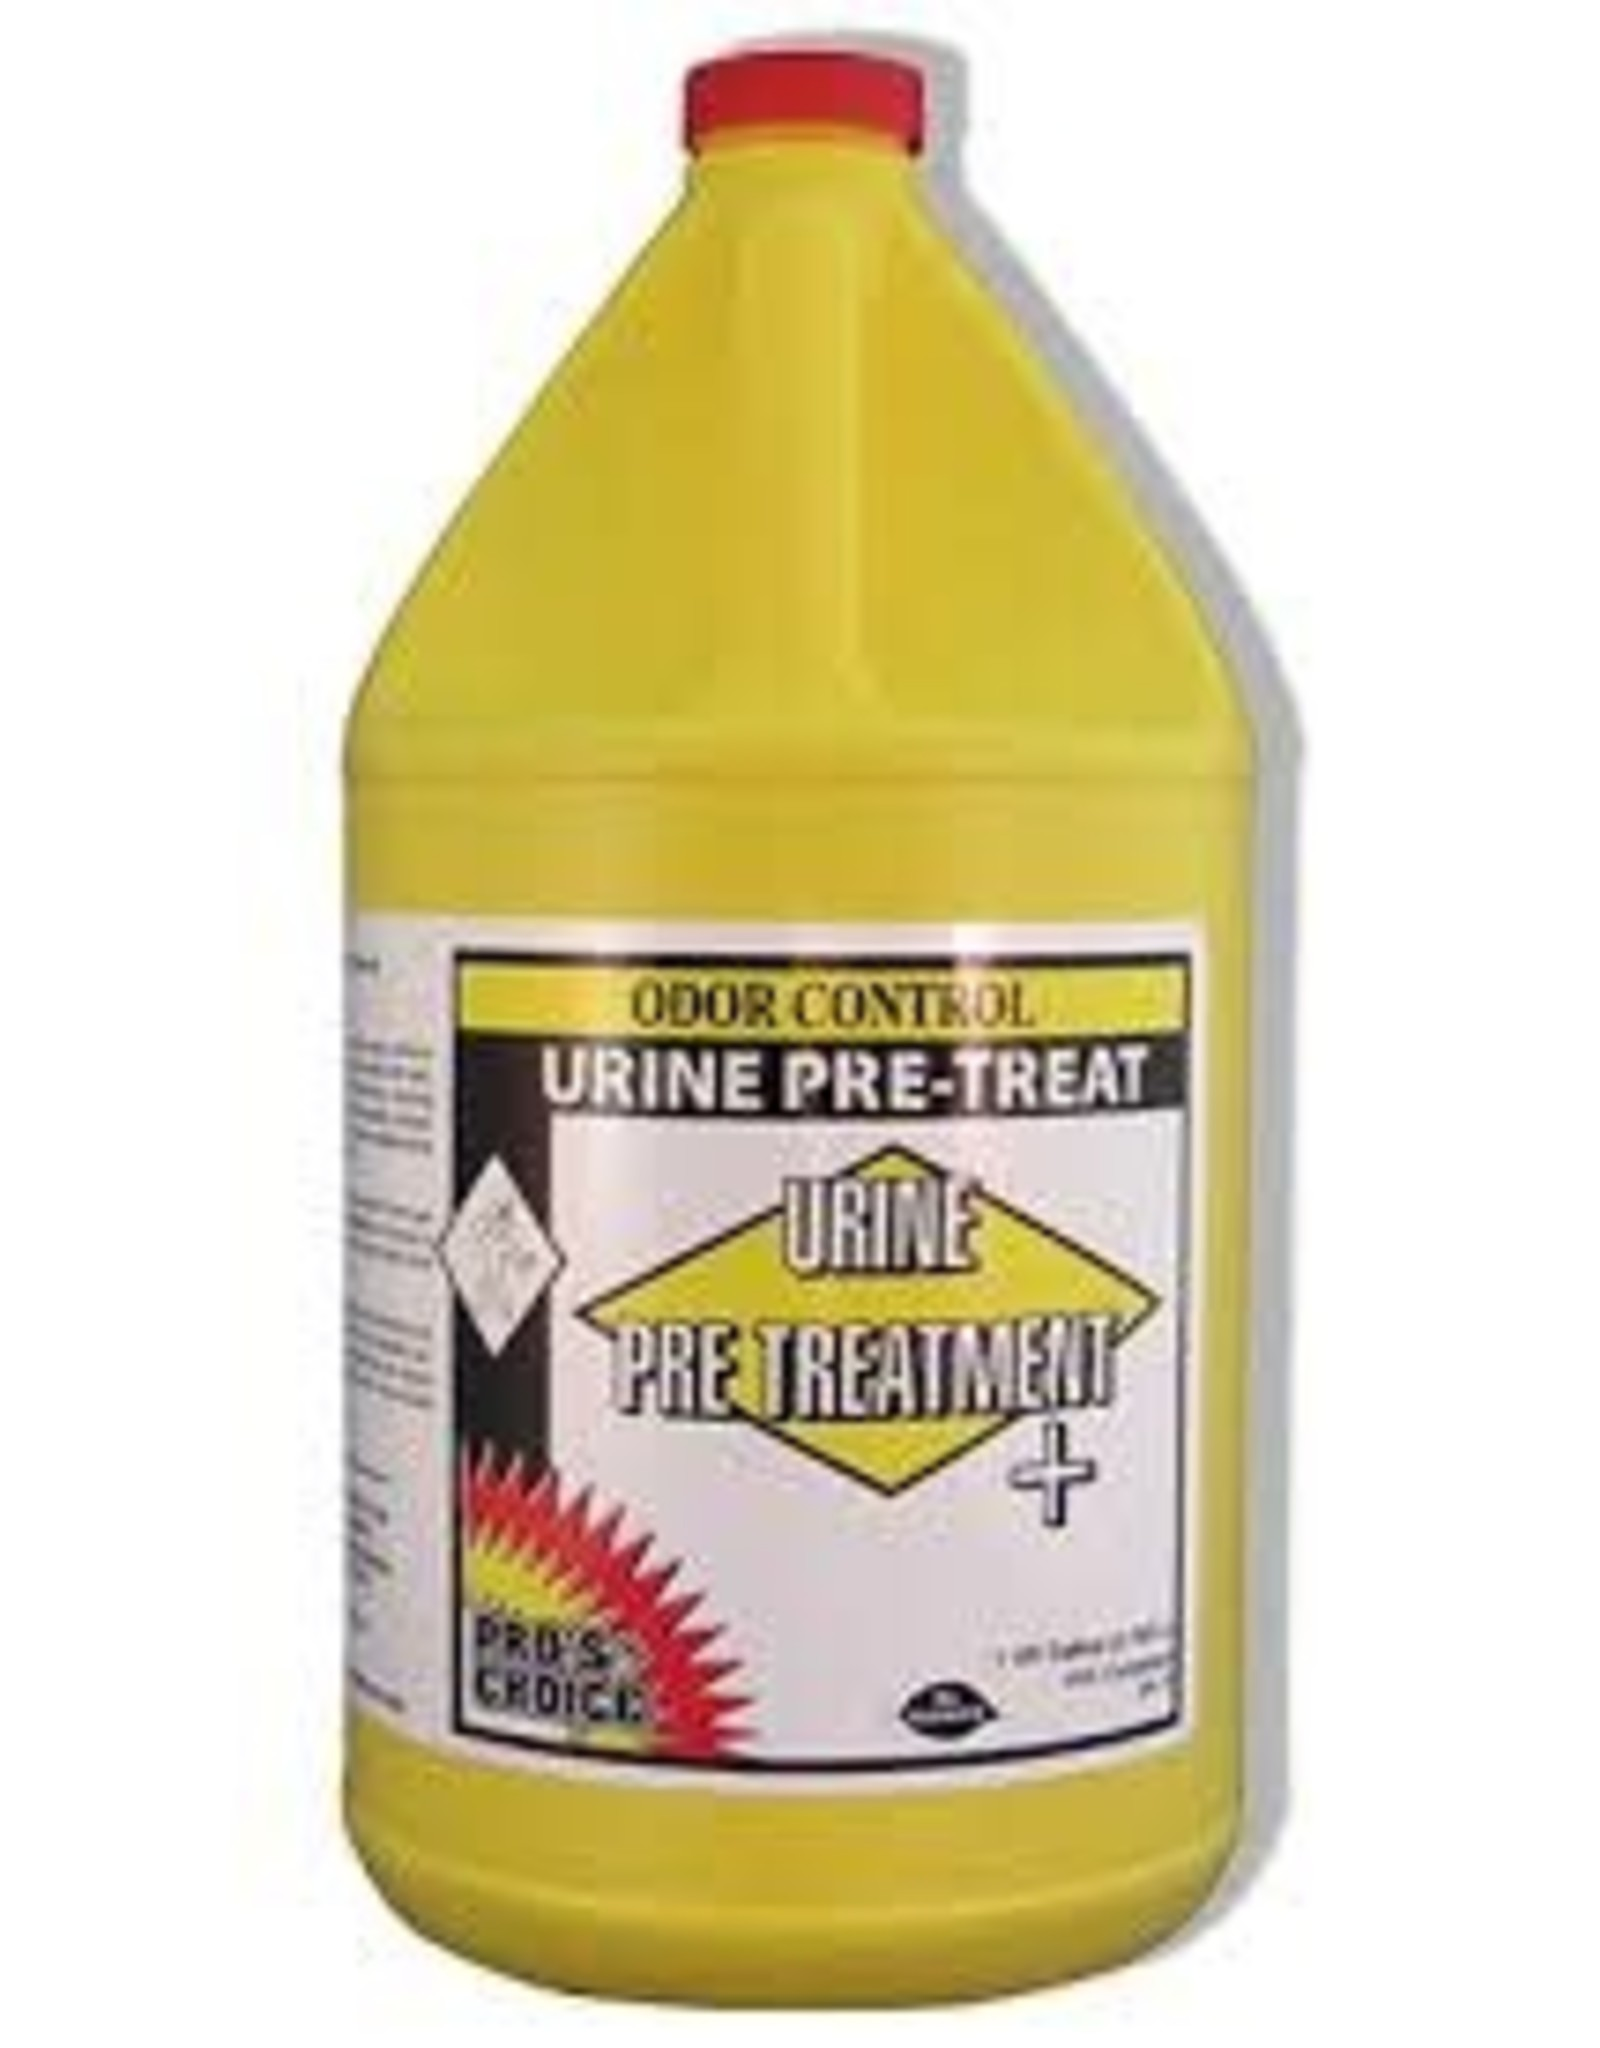 Pro's Choice Urine Pre-Treatment